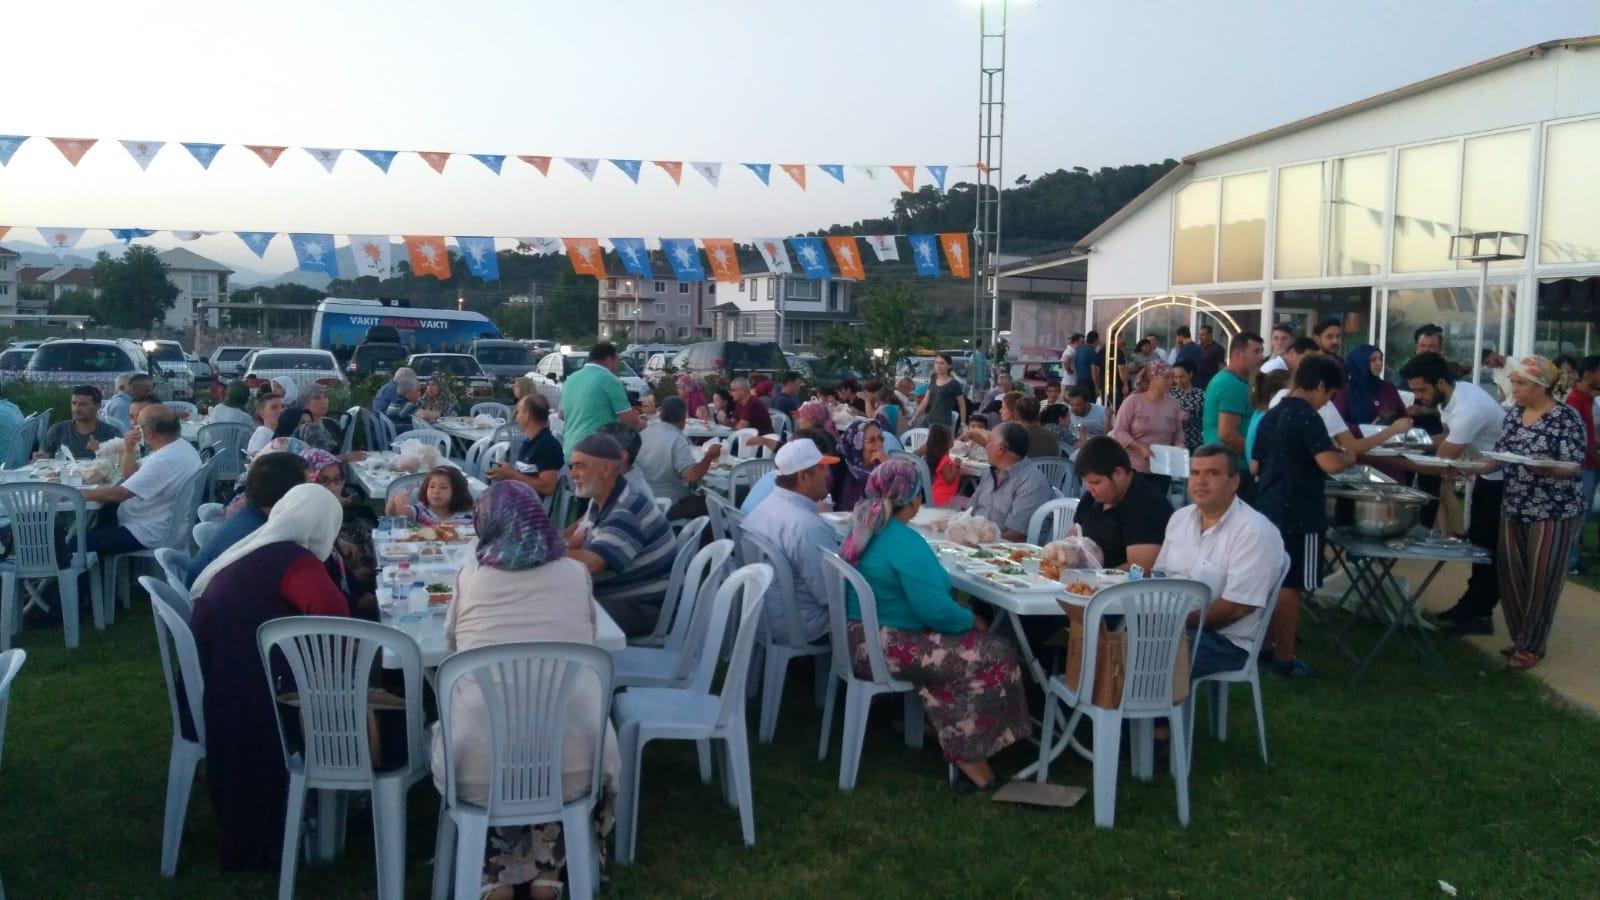 IMG 20180608 WA0022 - Dalaman AK Parti İftar yemeği düzenledi